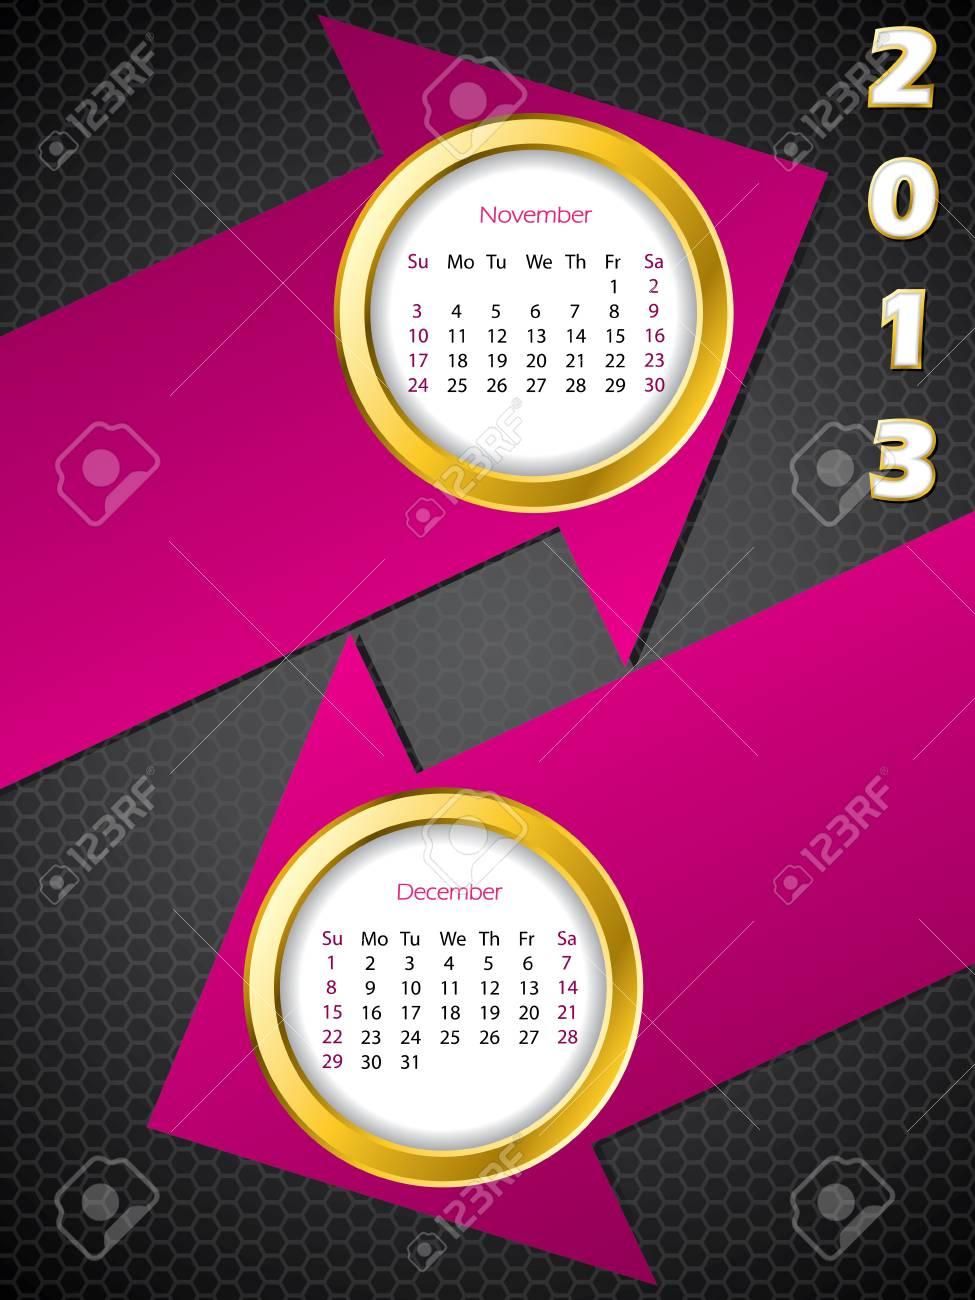 2013 arrow calendar for november and december months Stock Vector - 15516405